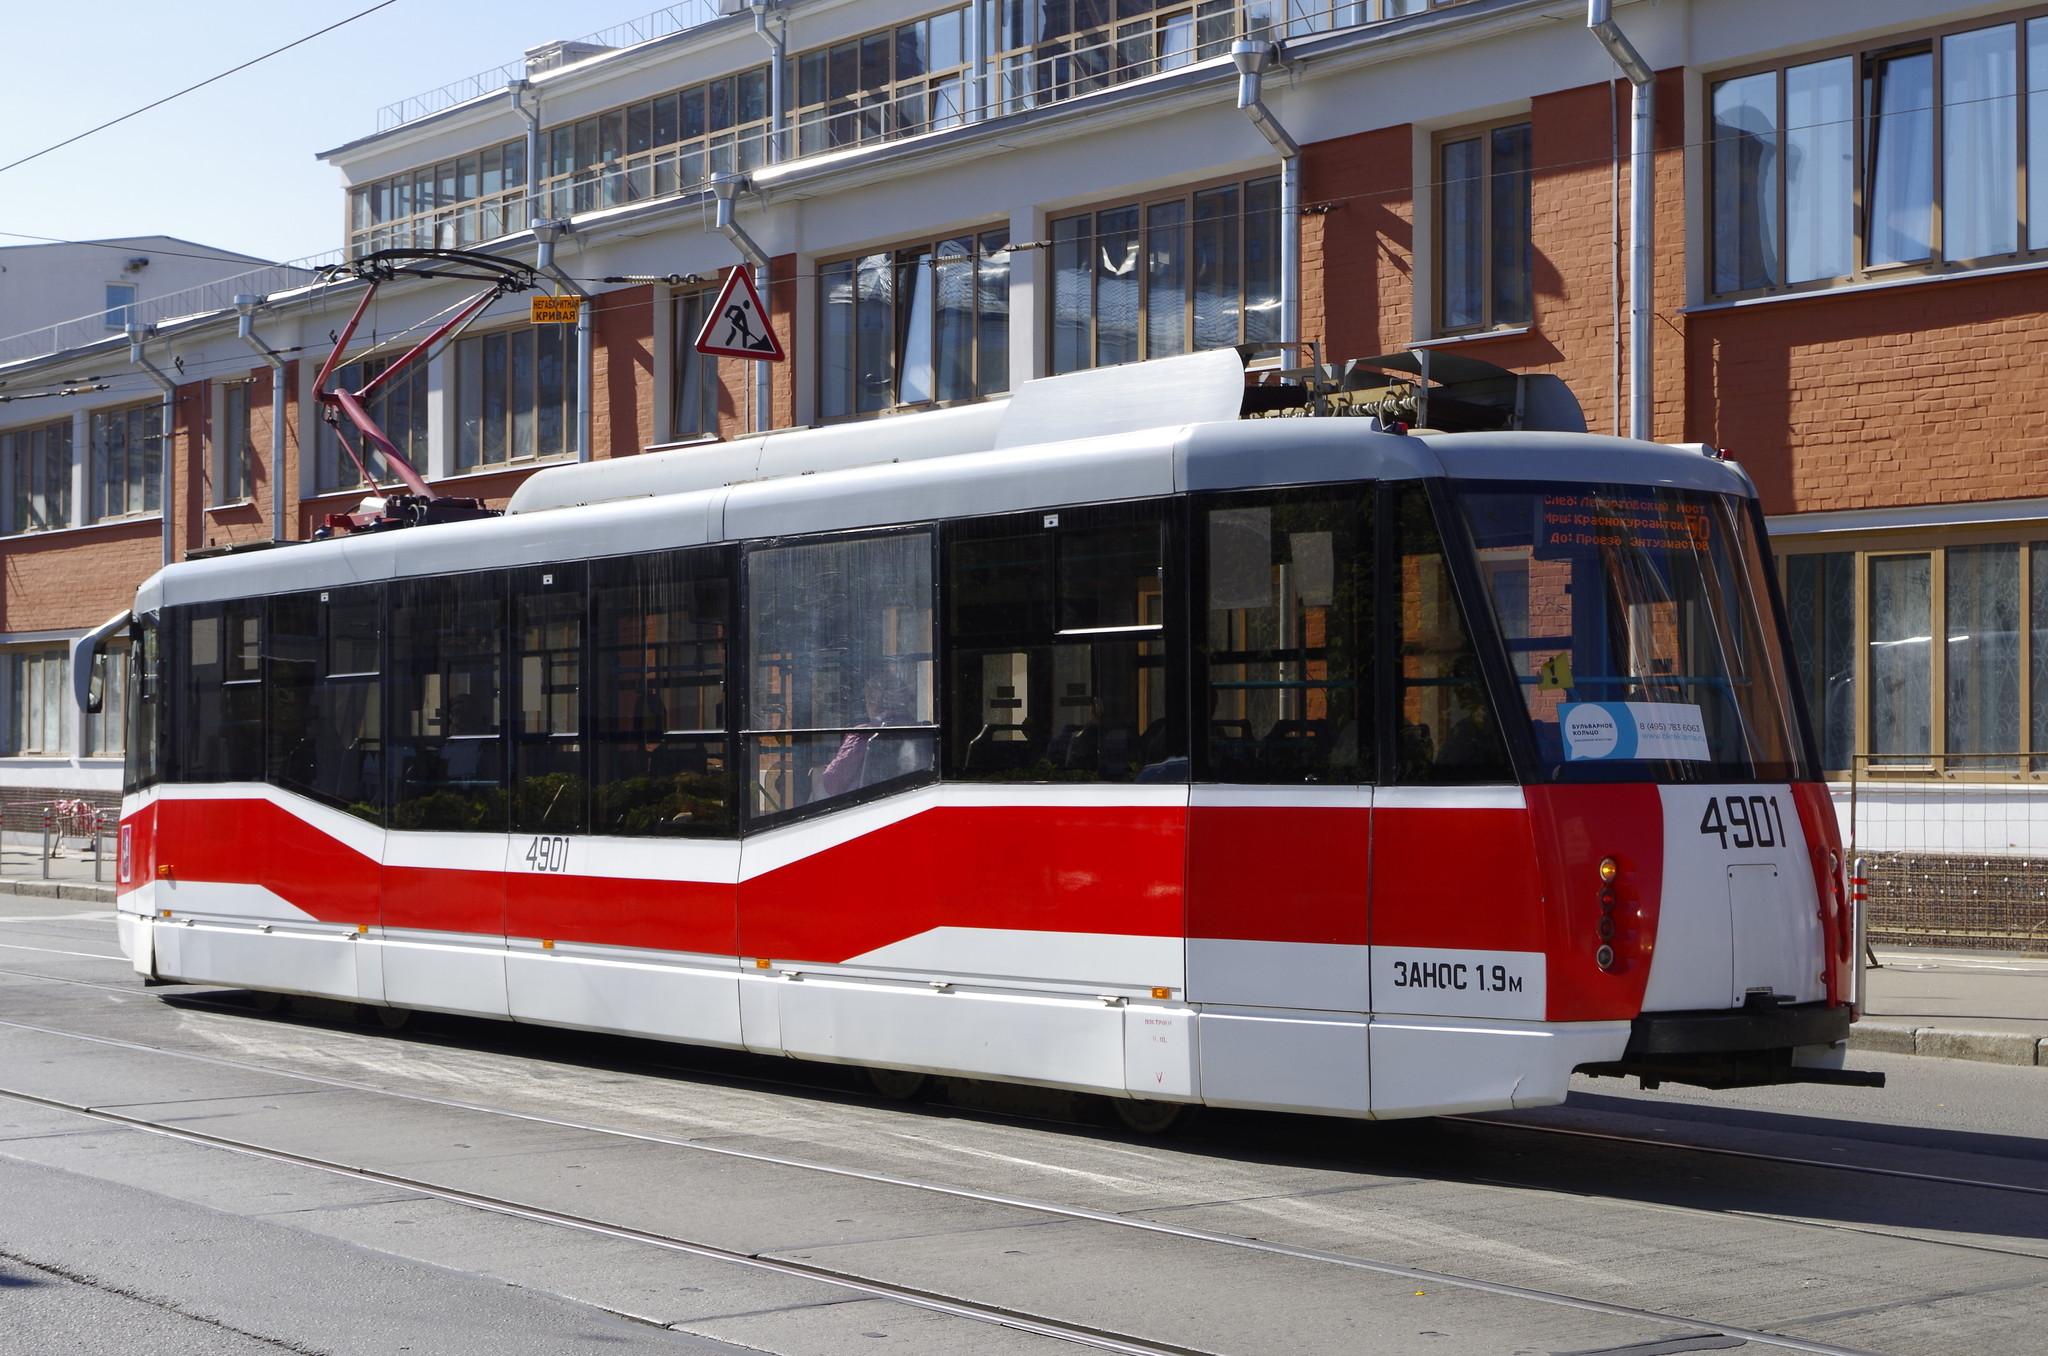 Трамвайный вагон № 4901 модель 71-153.3 (ЛМ-2008). Бауманская улица